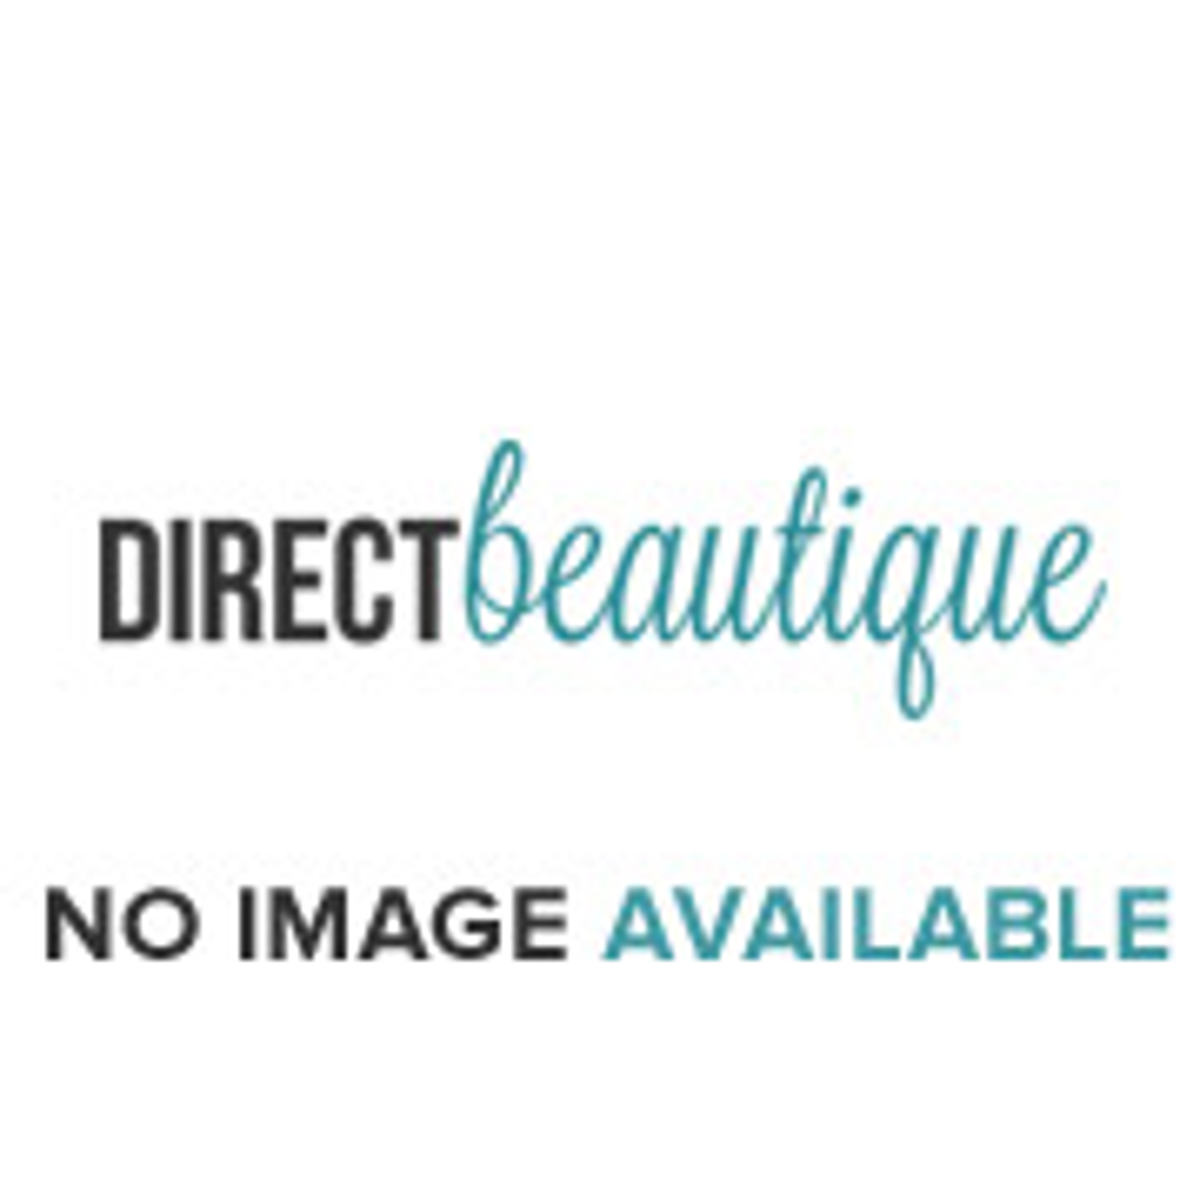 Lottie Slay All Day - Metallic - Shook Liquid Lipstick